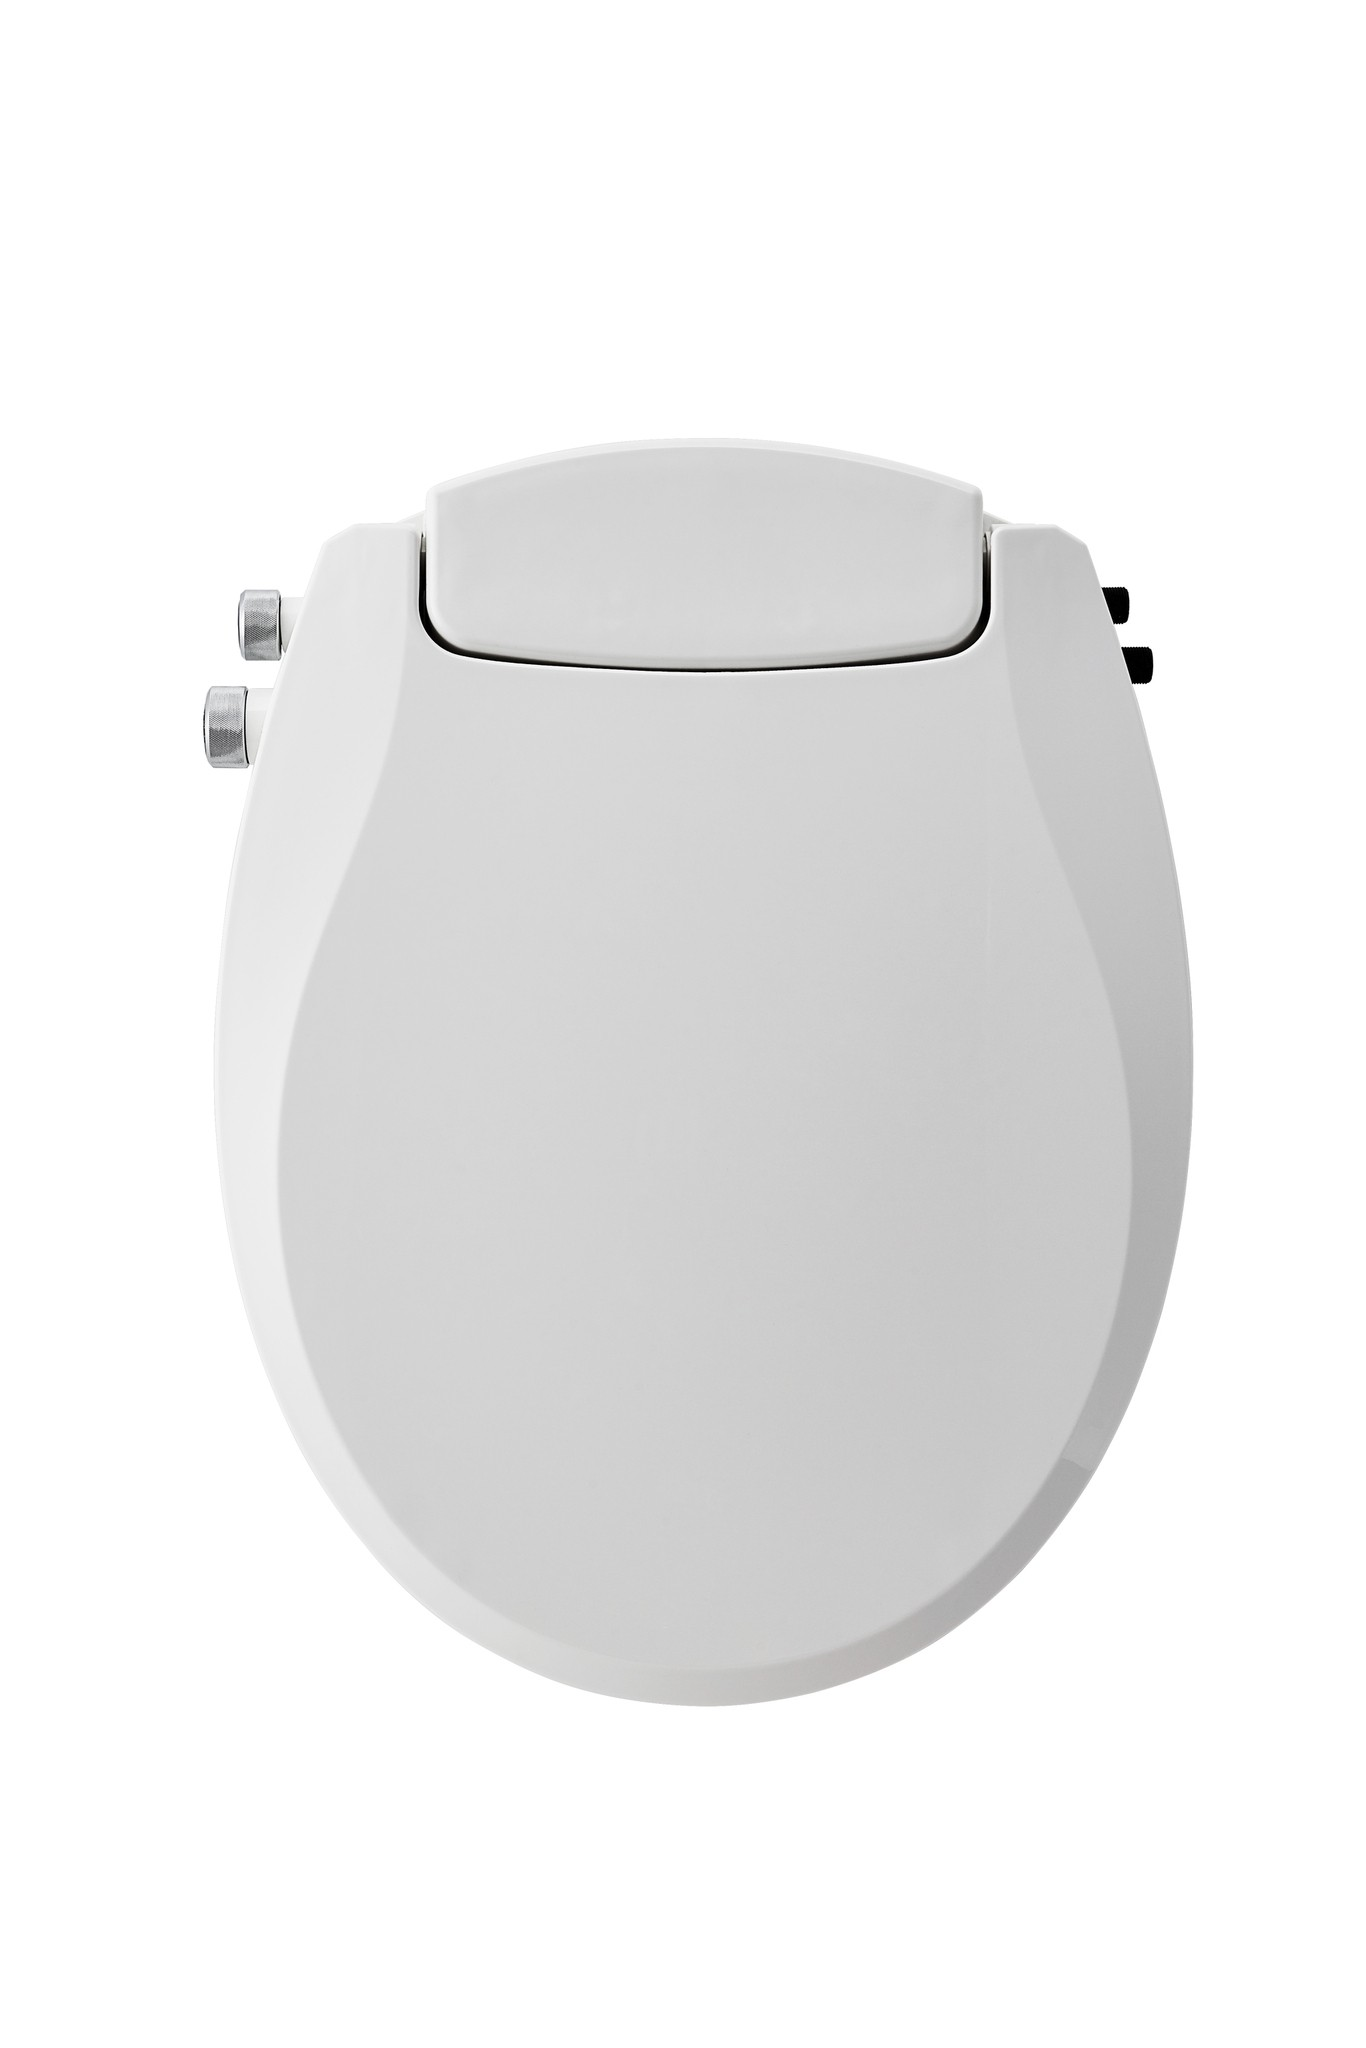 Maro D Italia Fp208 Hot Amp Cold Non Electric Bidet Toilet